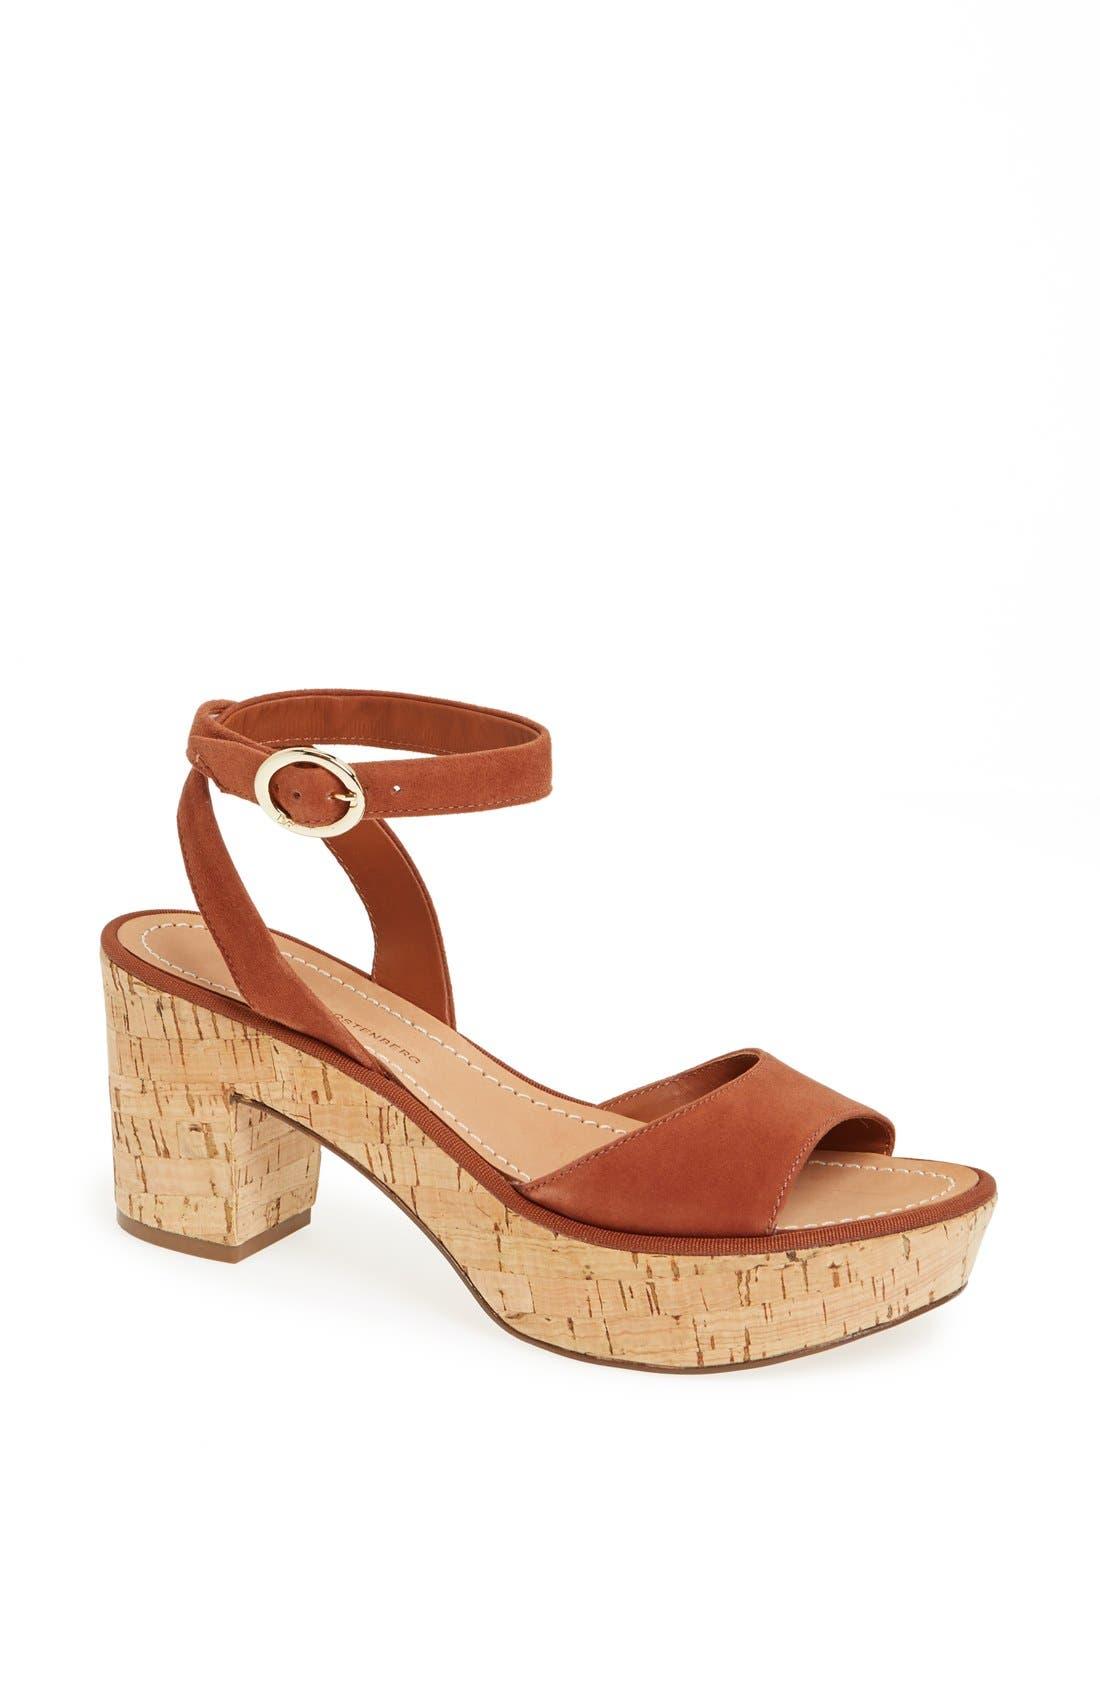 Main Image - Diane von Furstenberg 'Odelia' Sandal (Online Only)